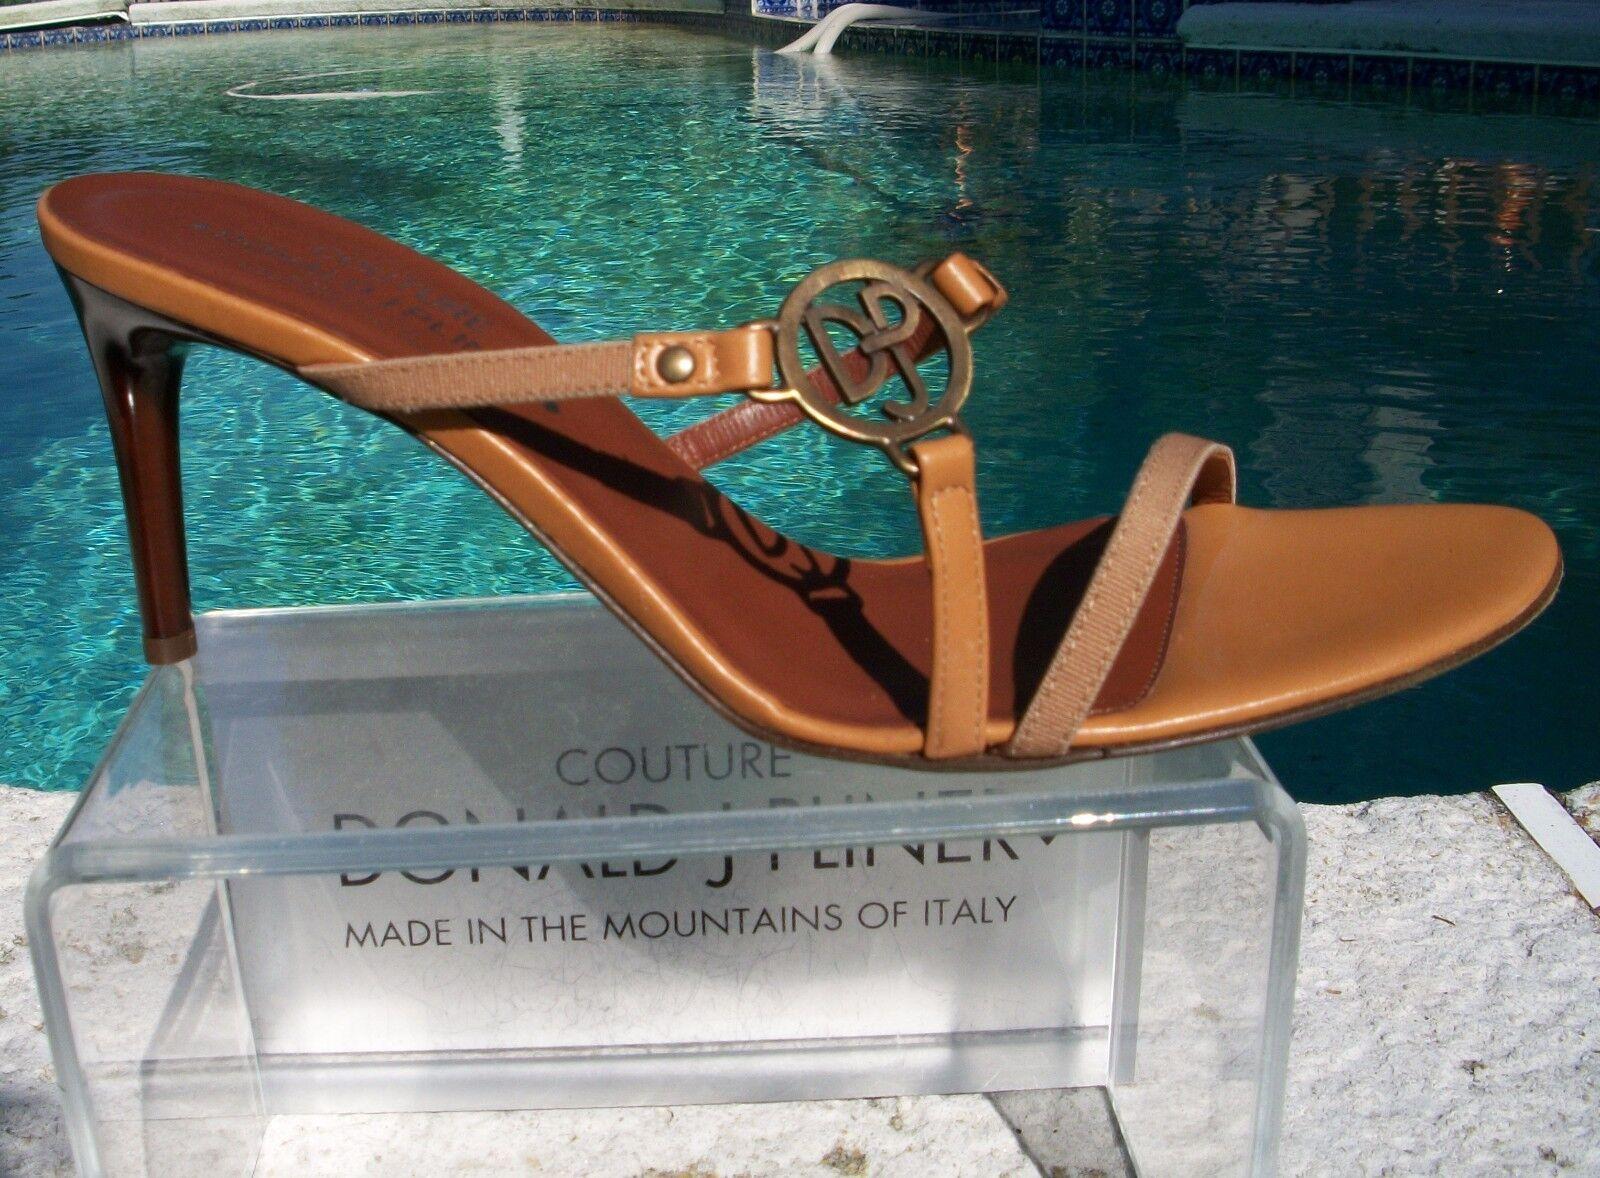 Donald Pliner Couture Camel Leather shoes New Sz 10 Strapy Sandal Slide  235 NIB